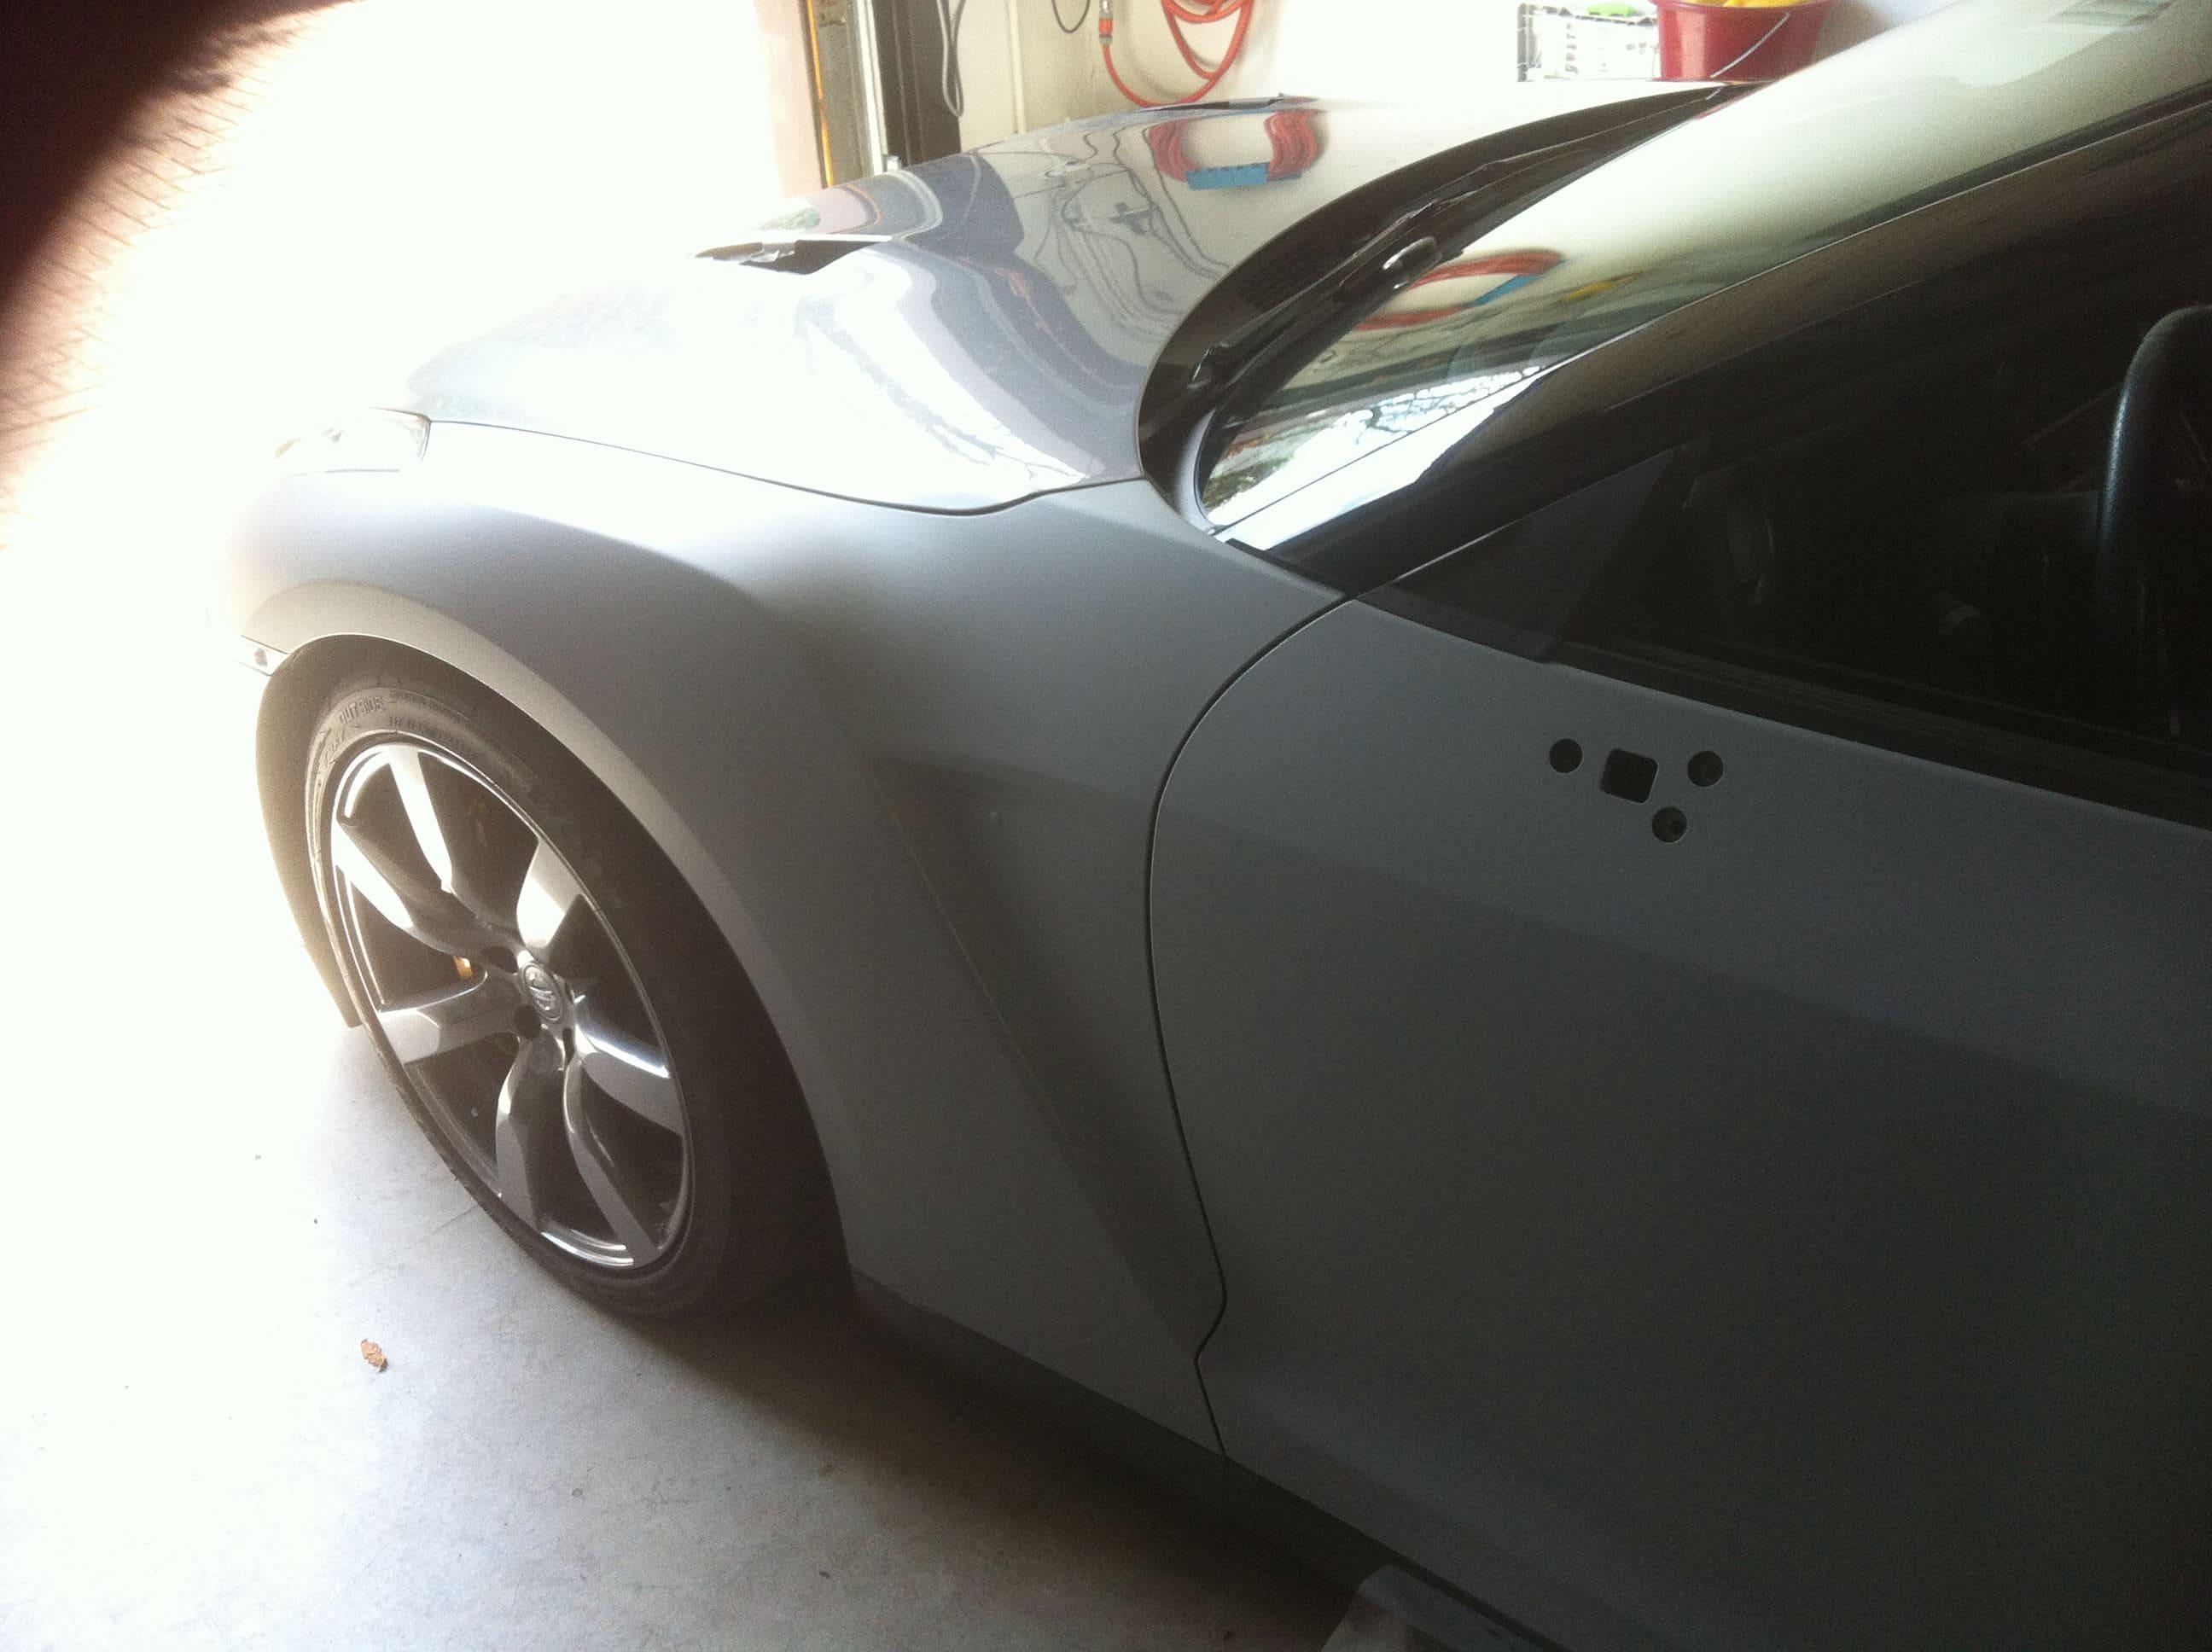 Nissan GT-R met Mat Grijze Wrap, Carwrapping door Wrapmyride.nu Foto-nr:6546, ©2020